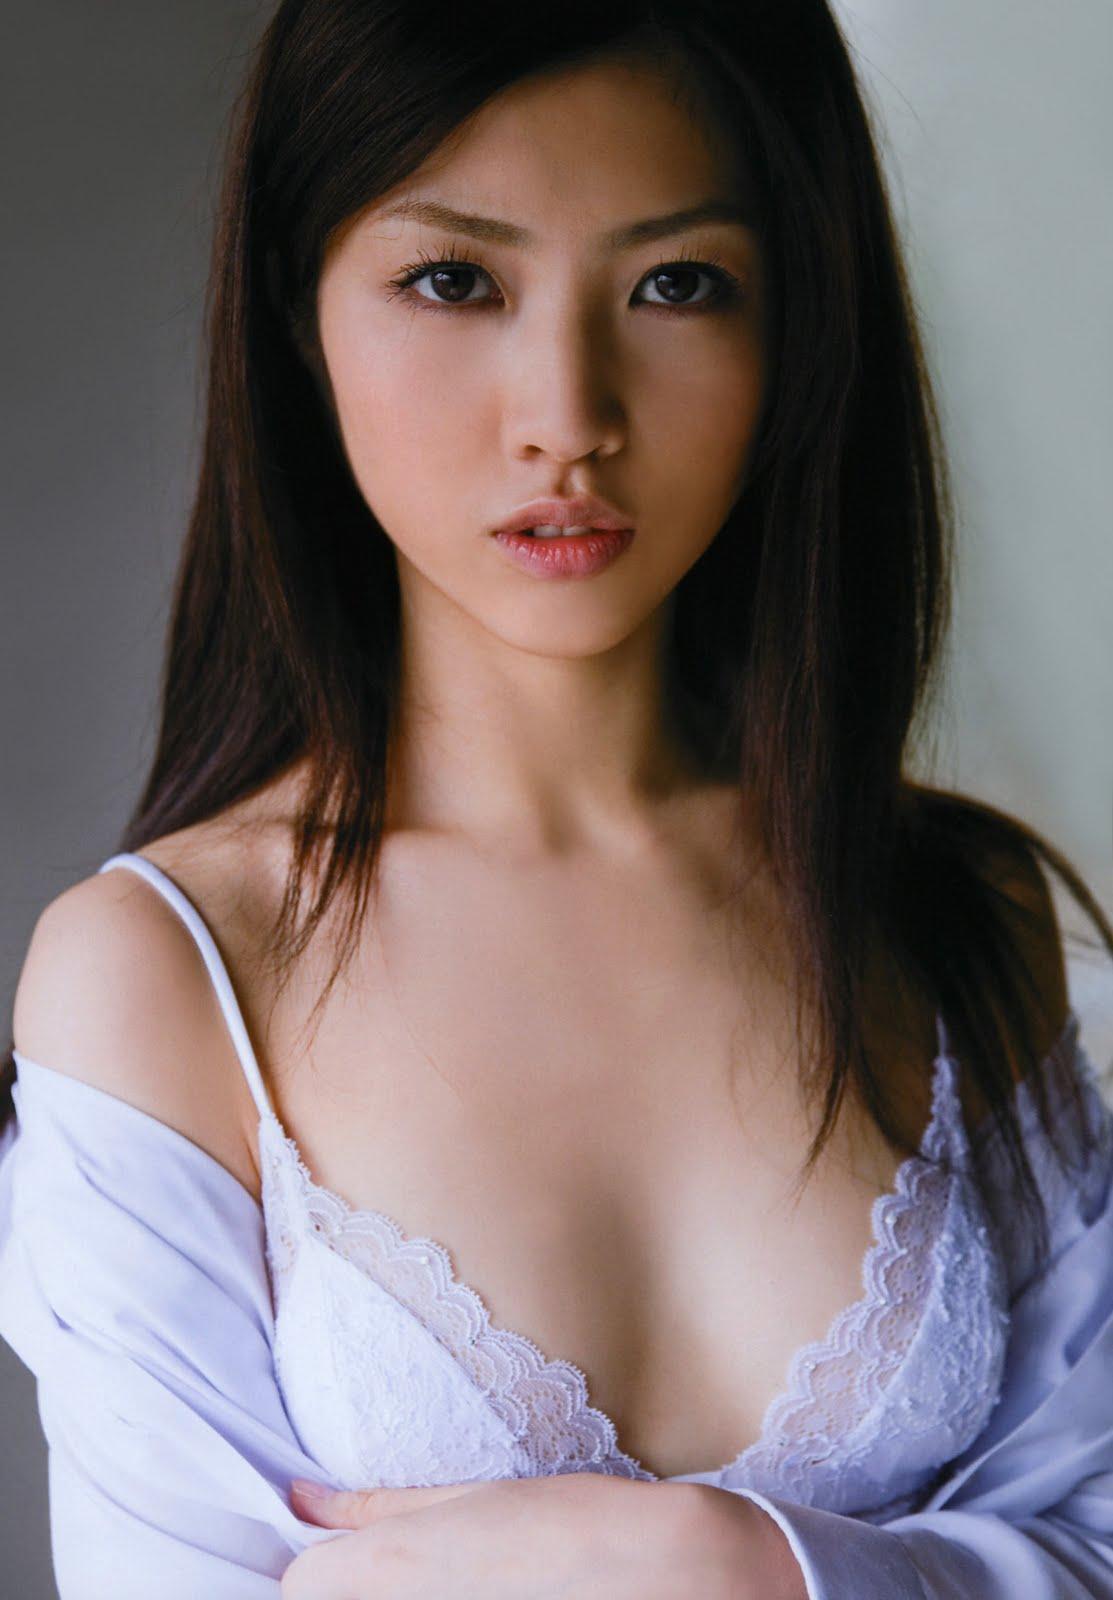 cute japanese women